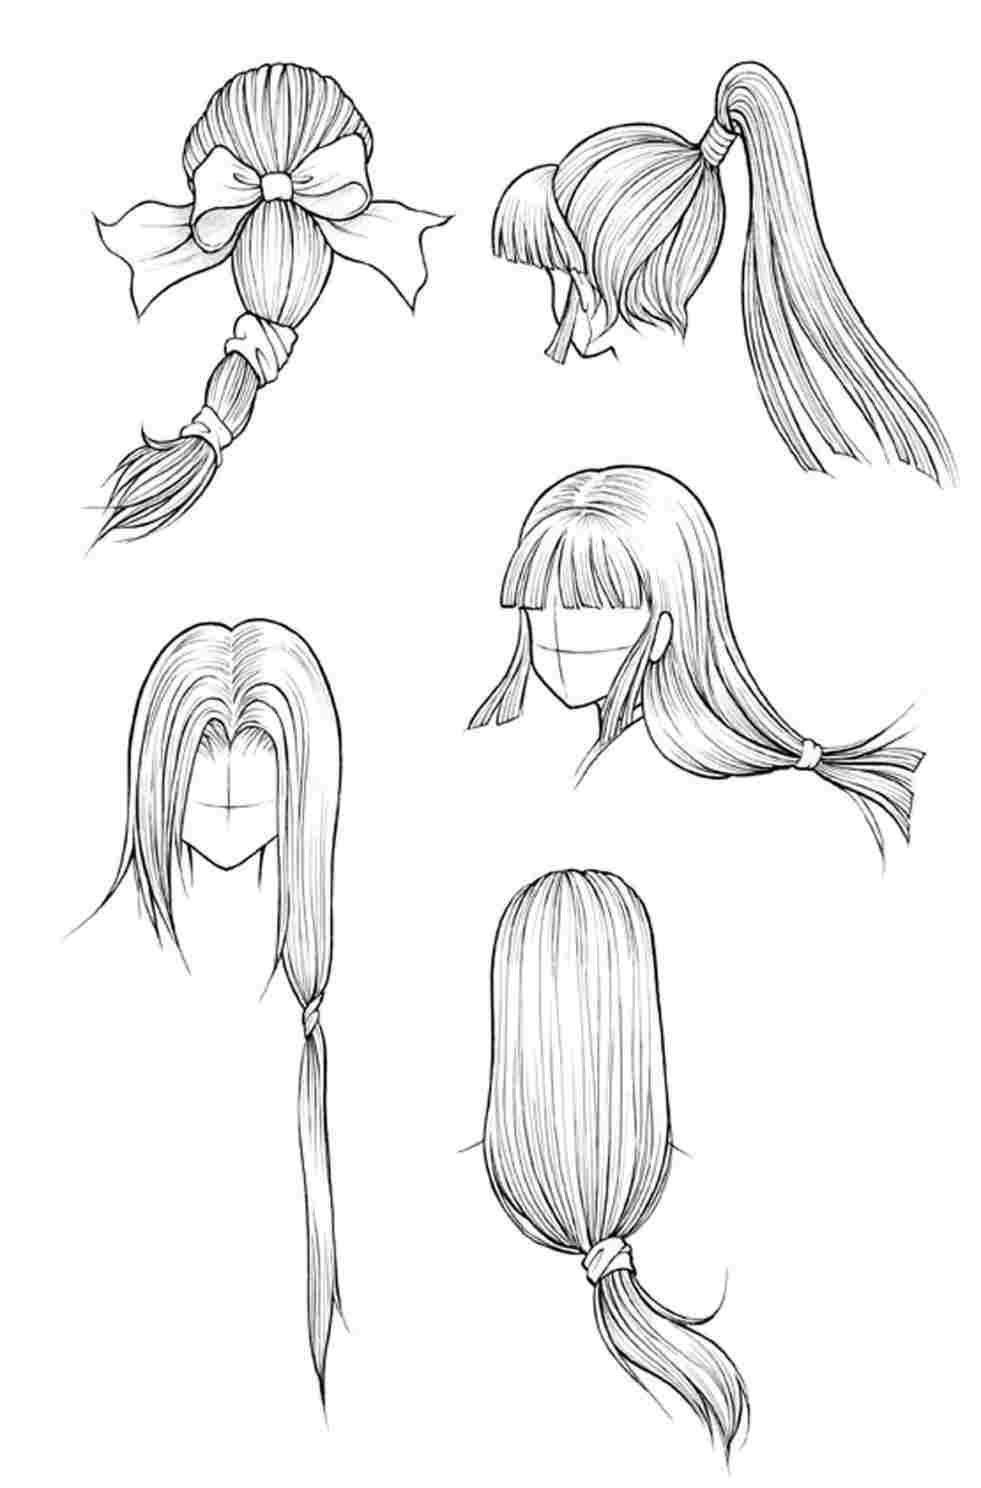 Hairstyles Drawing Easy Pin Anime Ponytail Hairstyles Drawing By Rugrat Kid On Hairstyles Male Hairstyles Drawi In 2020 Long Hair Drawing Manga Hair Long Hair Girl